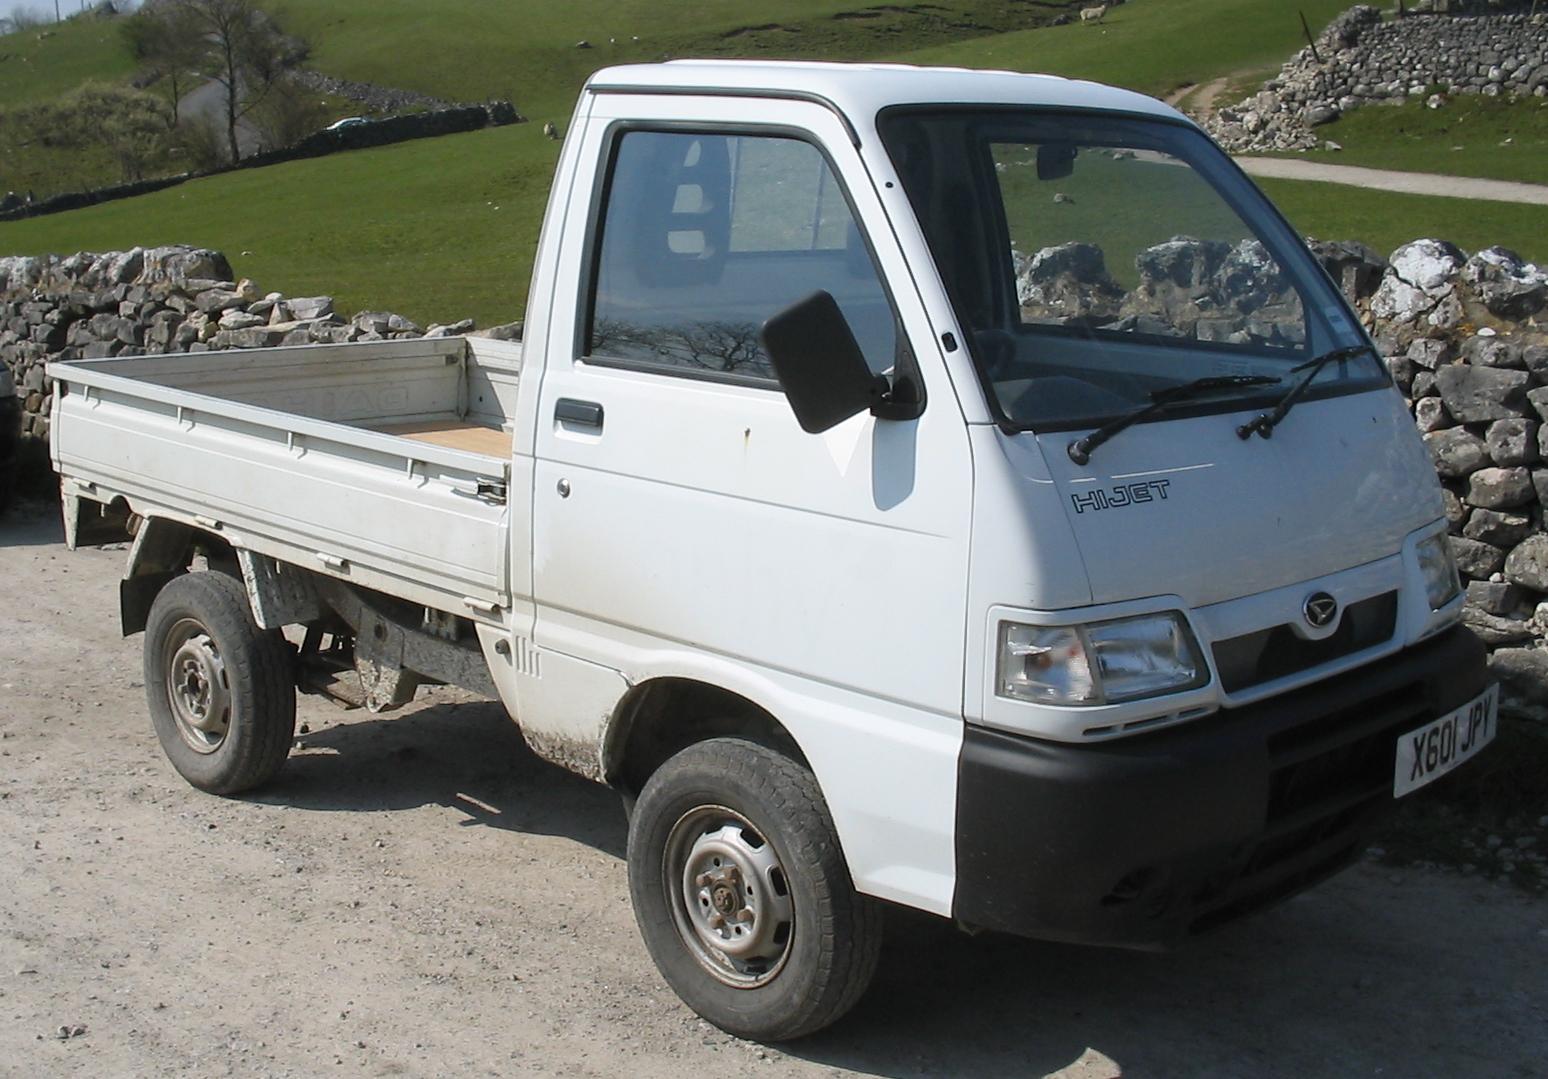 Daihatsu Related Imagesstart 50 Weili Automotive Network Pyzar Wiring Diagram Filedaihatsu Hijet Pickup